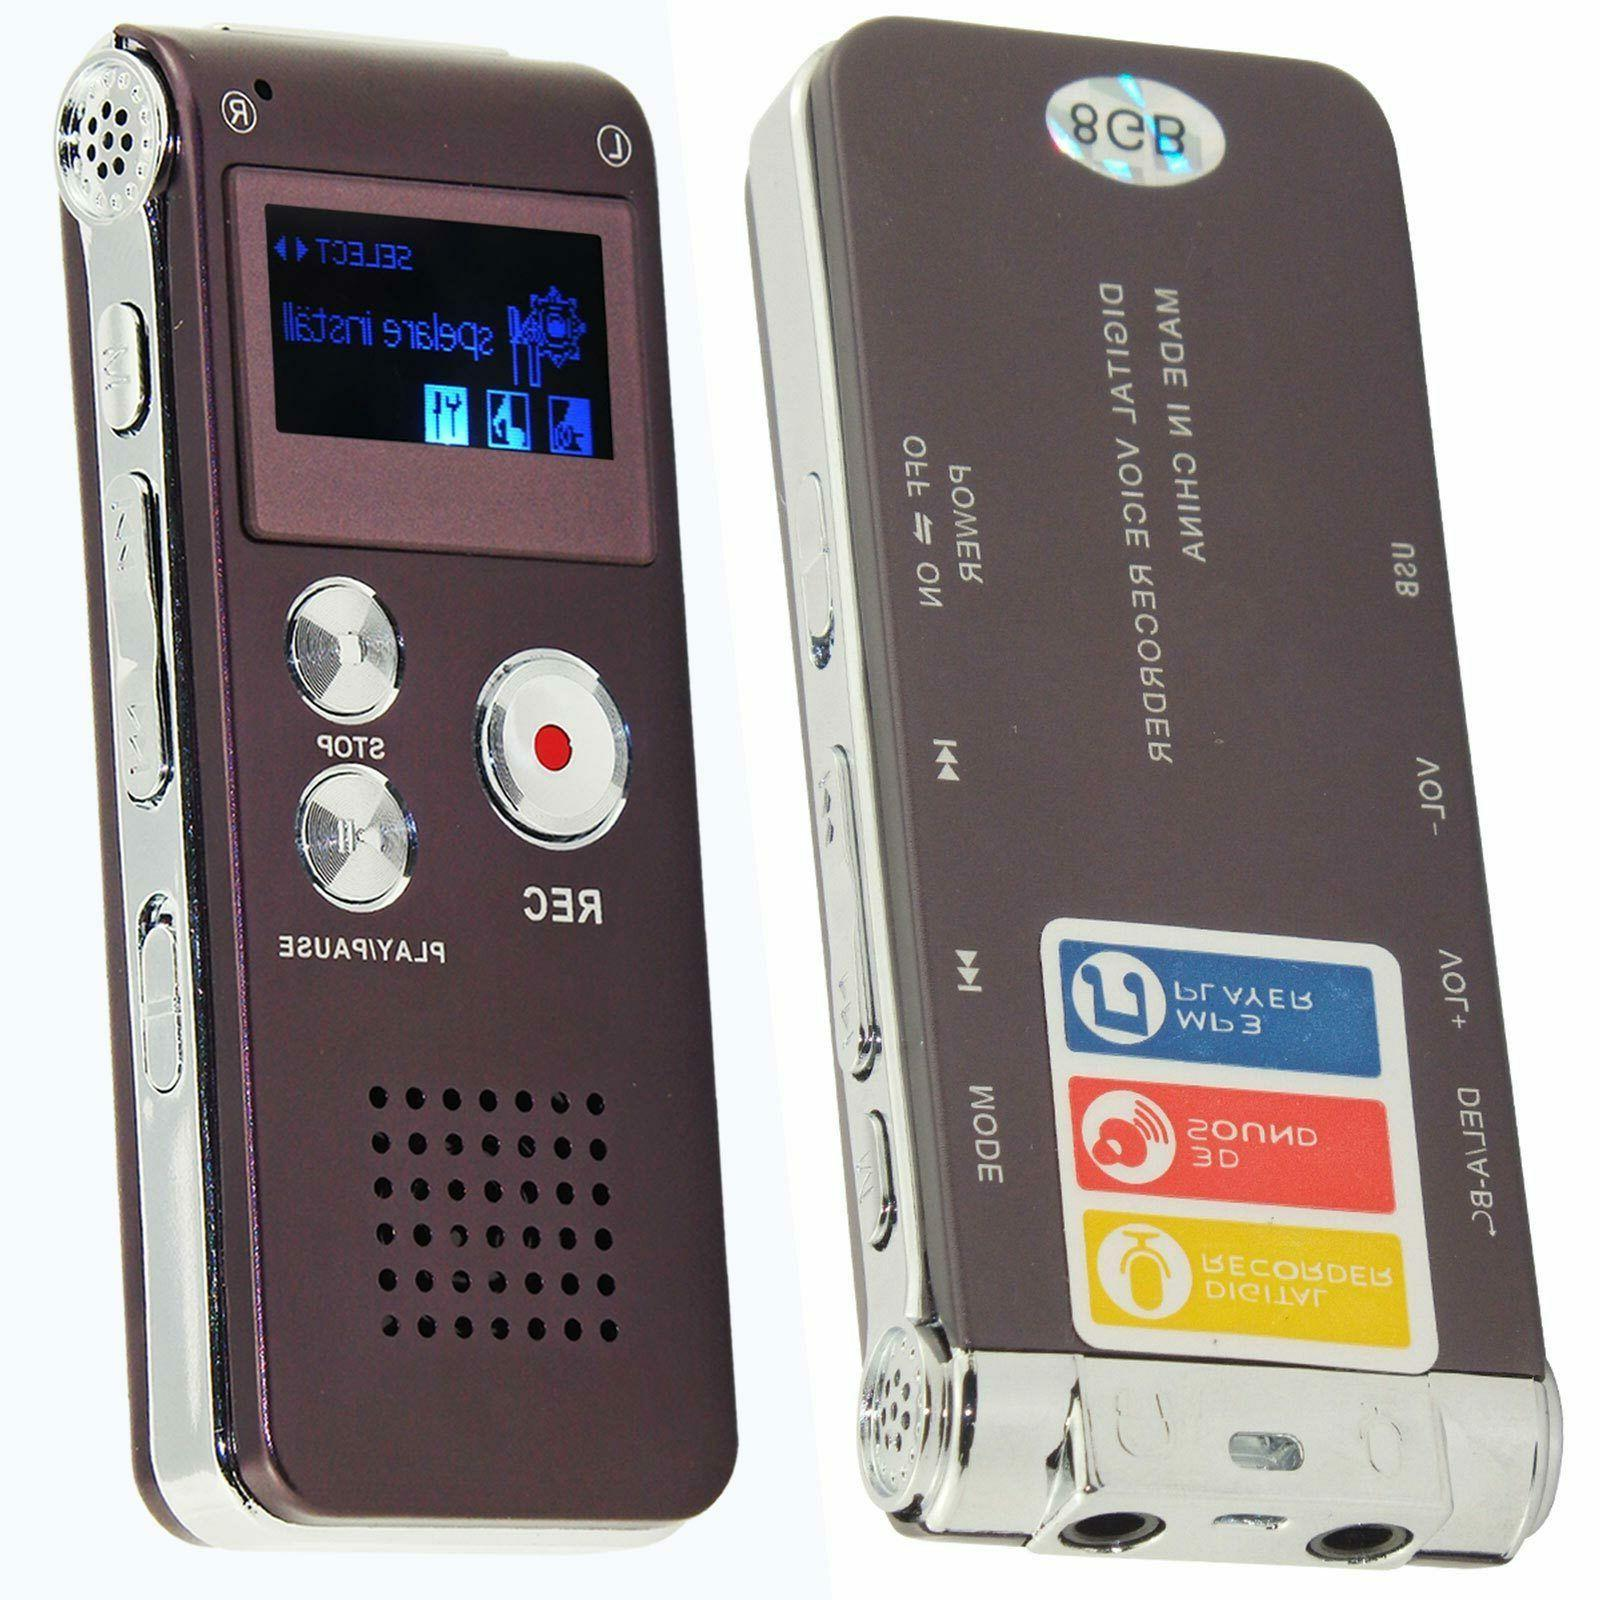 8GB Sound Voice Recorder Dictaphone MP3